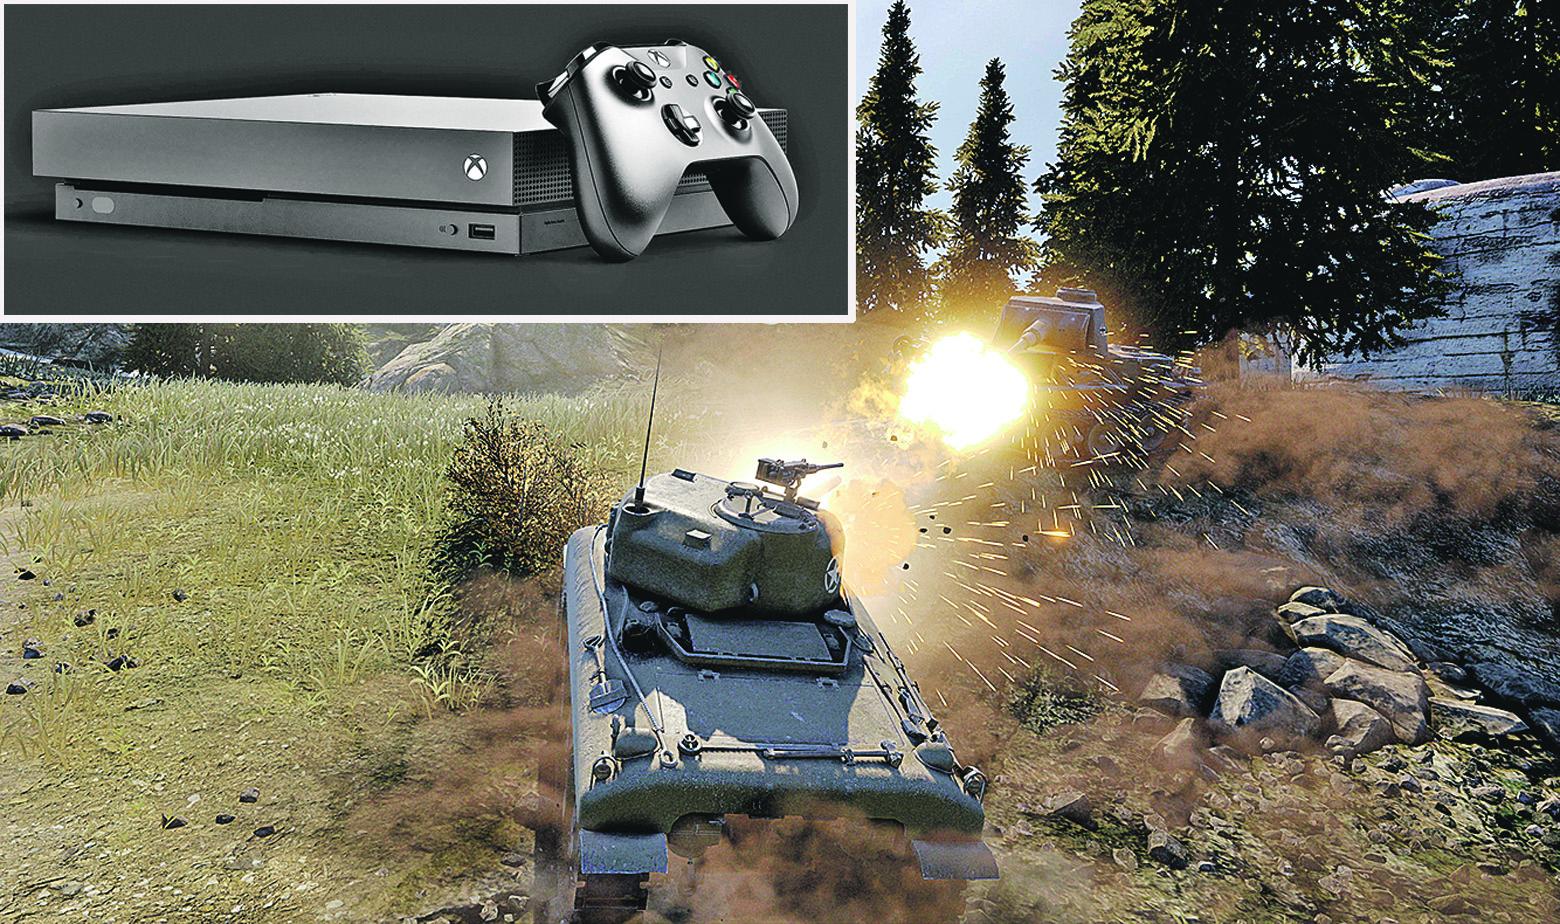 Xbox World of Tanks